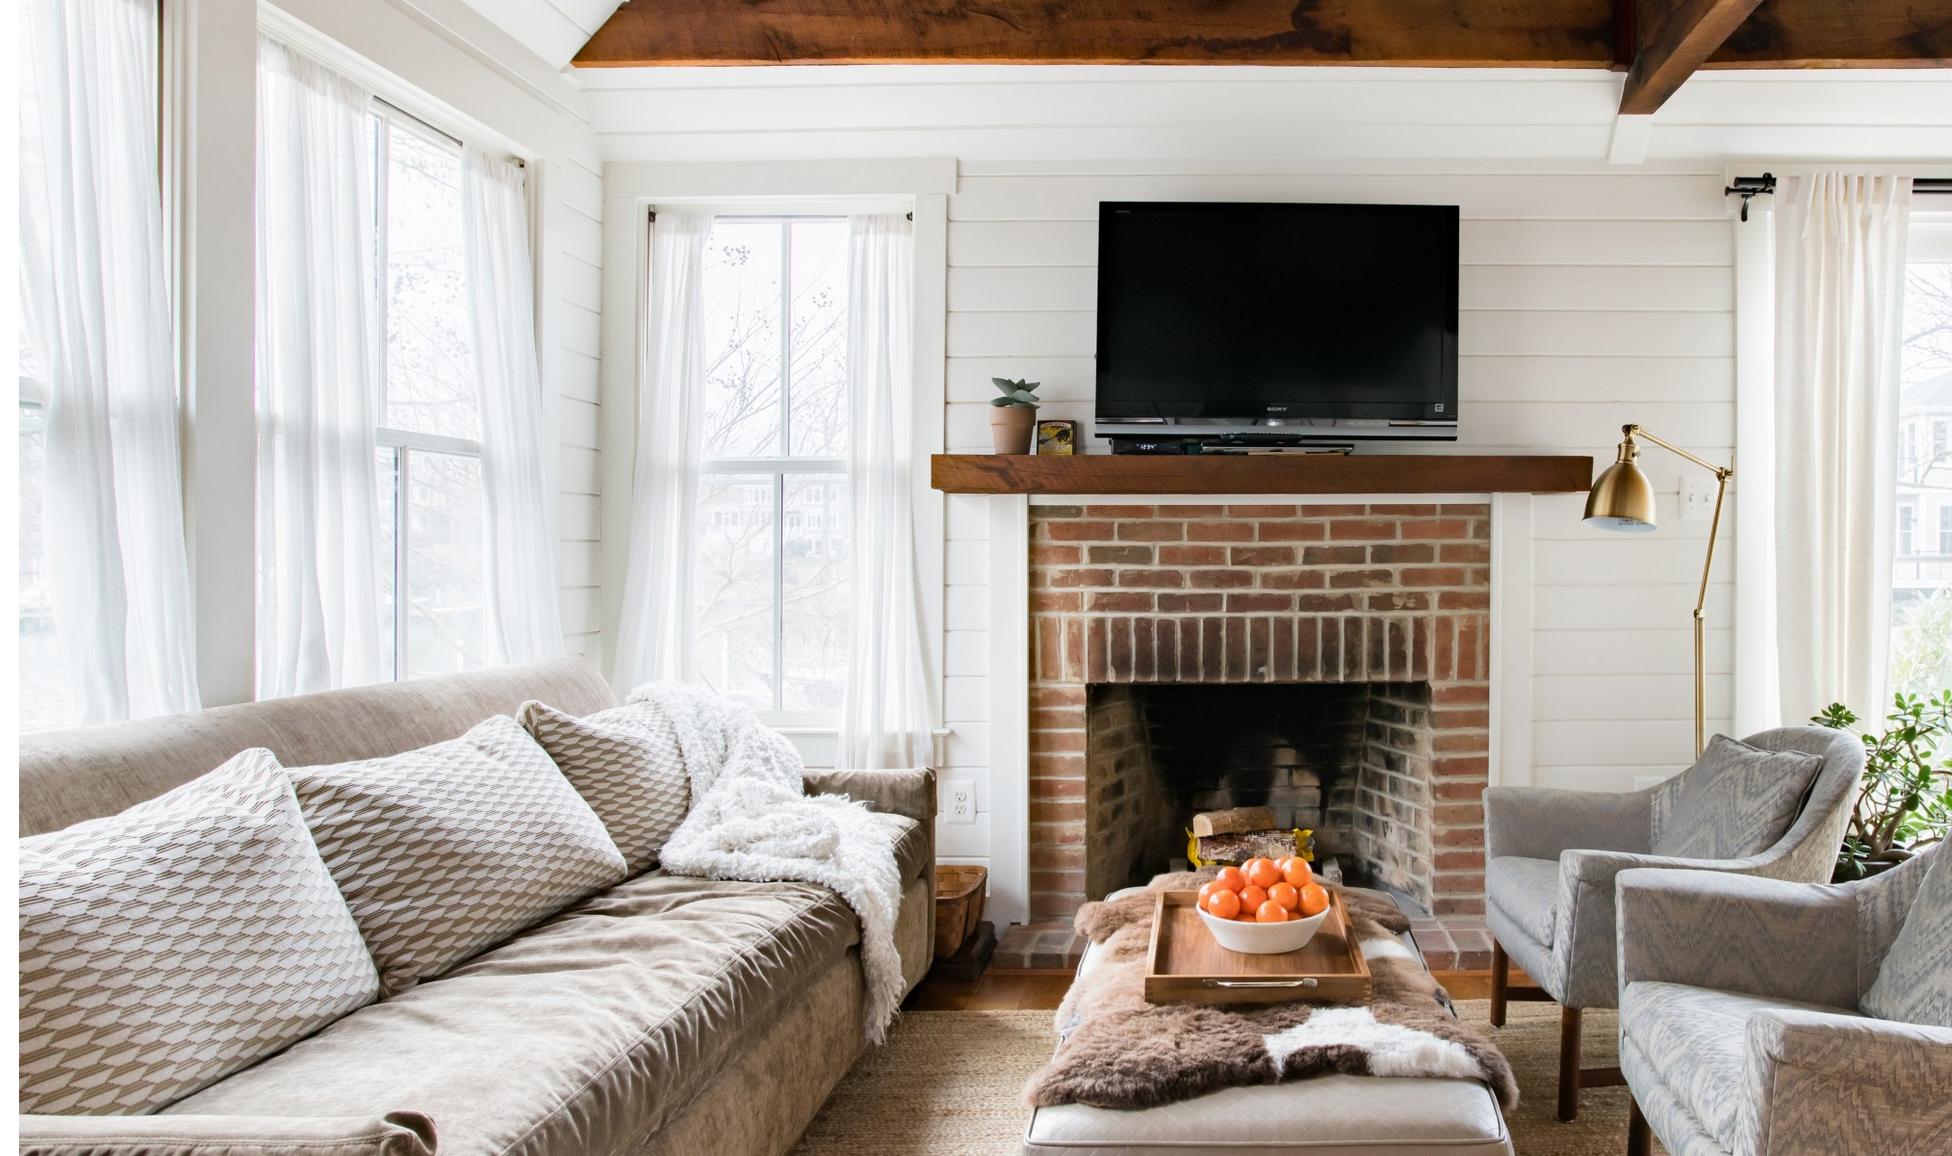 Sensational Look Inside My Home A Historic Annapolis Guest Cottage Interior Design Ideas Helimdqseriescom